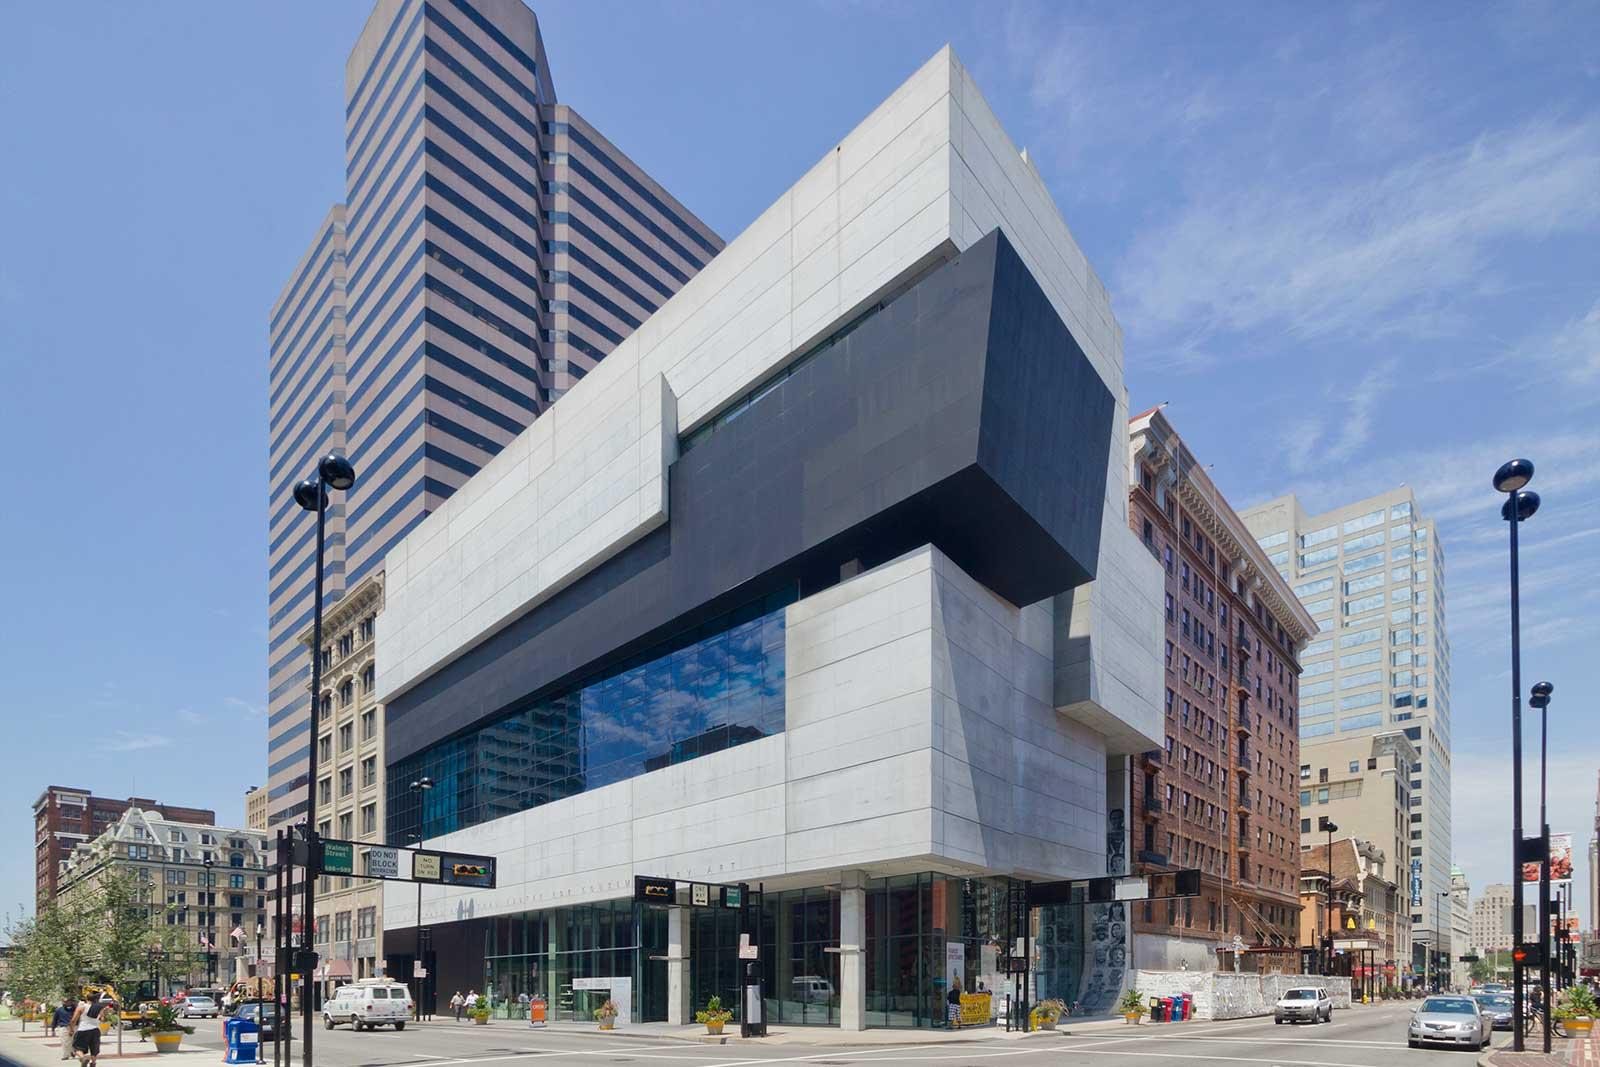 Rosenthal Center for Contemporary Art in Cincinnati